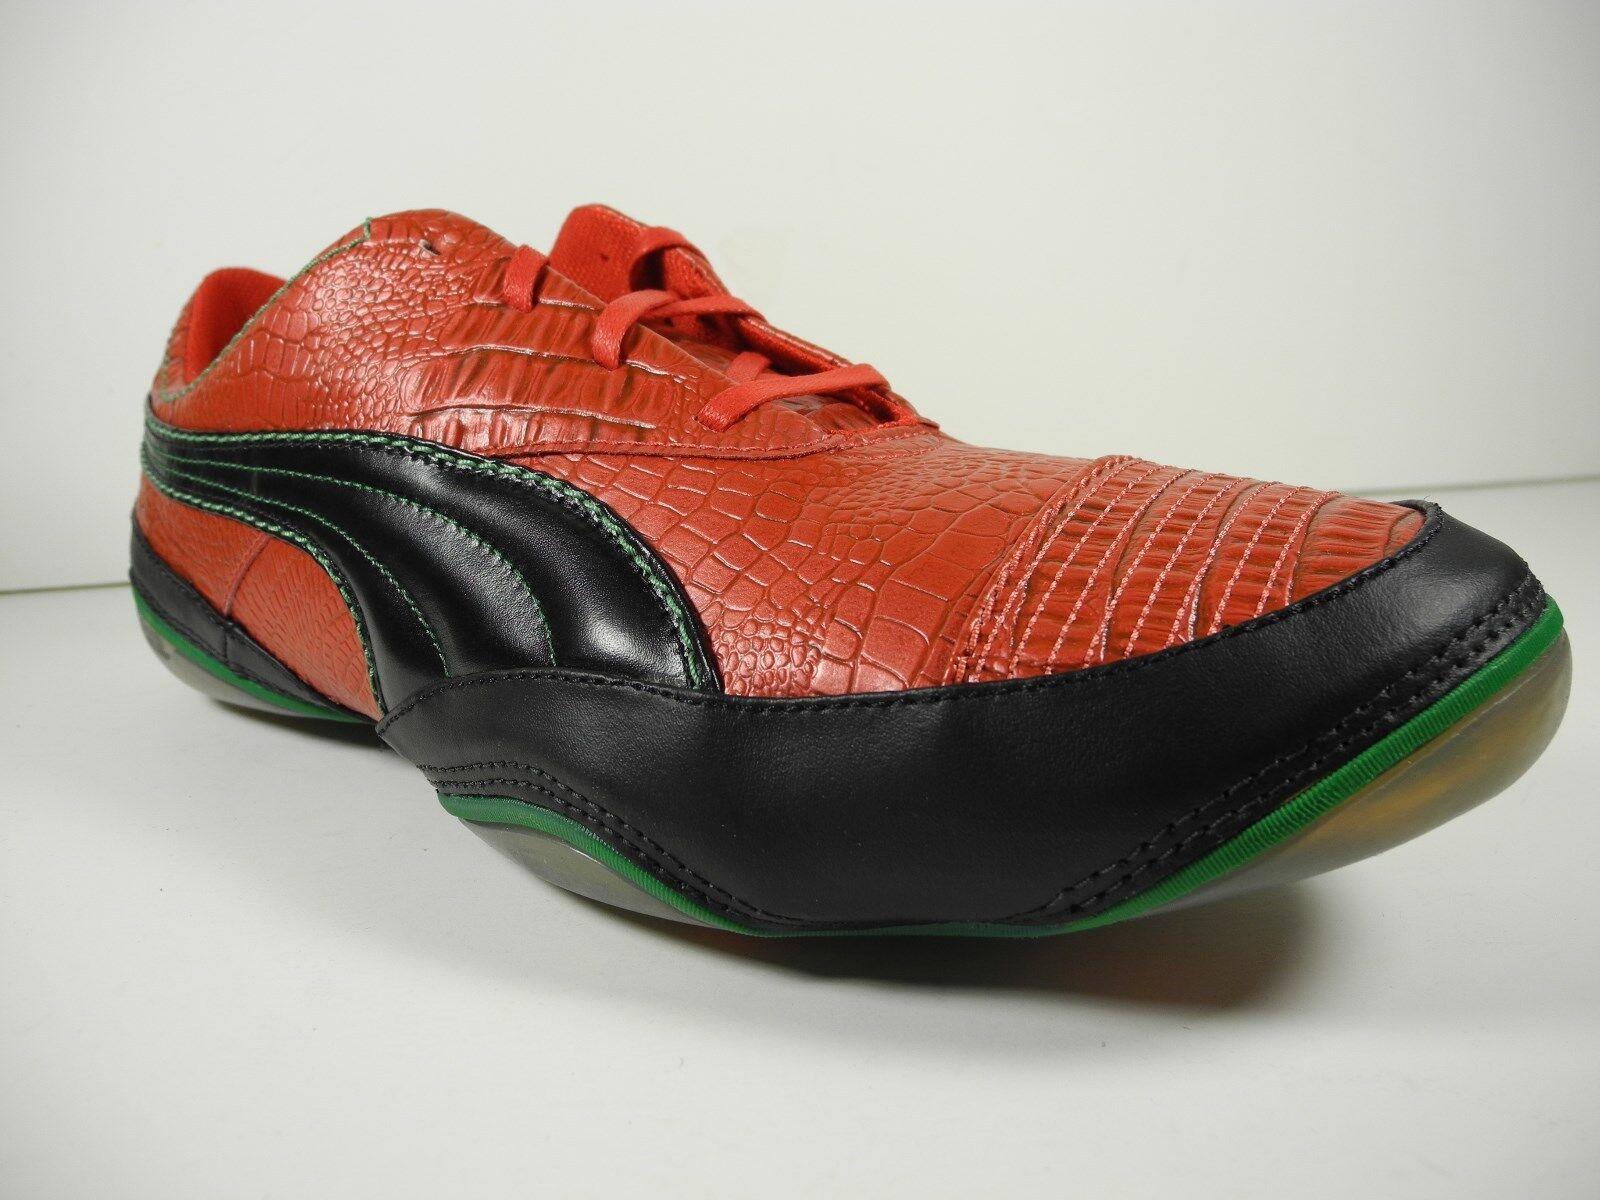 NEW Puma USAN METALLIC CROC Men's Shoes Size 11.5 1